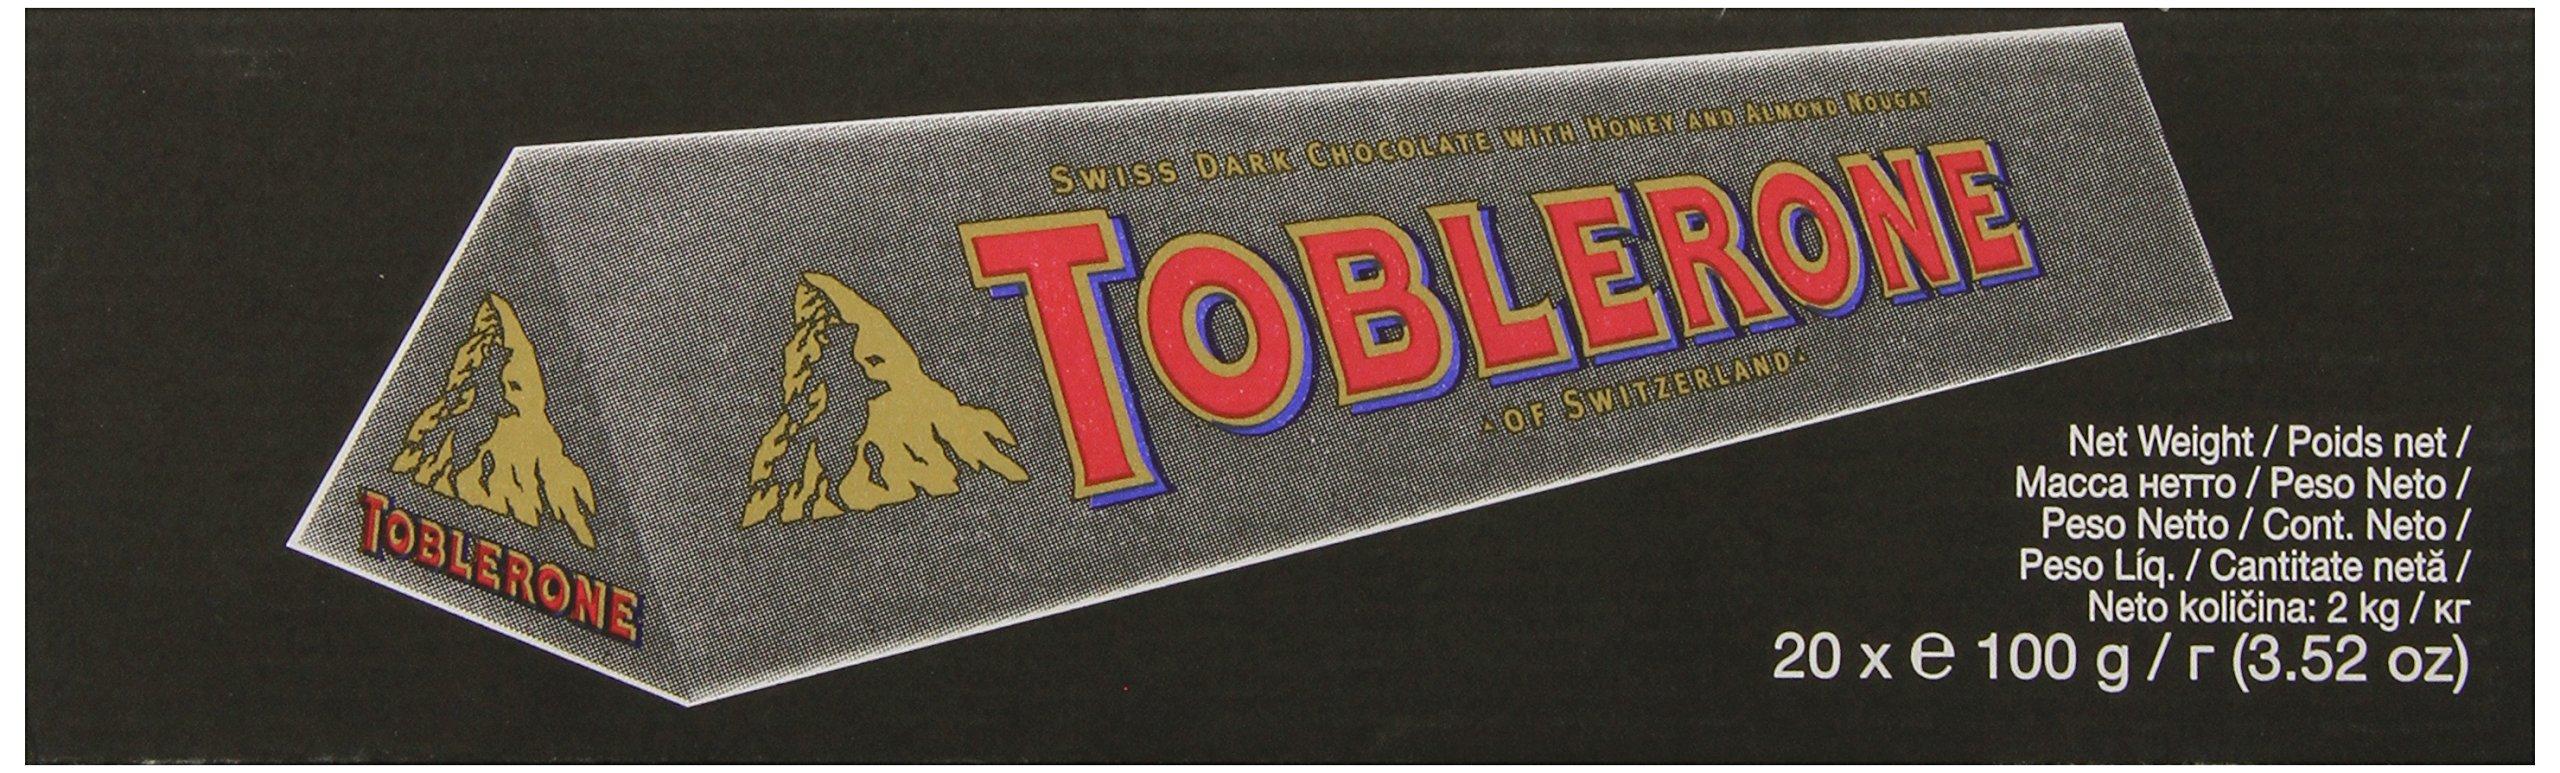 Toblerone Chocolate Bar, Dark, 3.52 Ounce (Pack of 20) by Toblerone (Image #5)